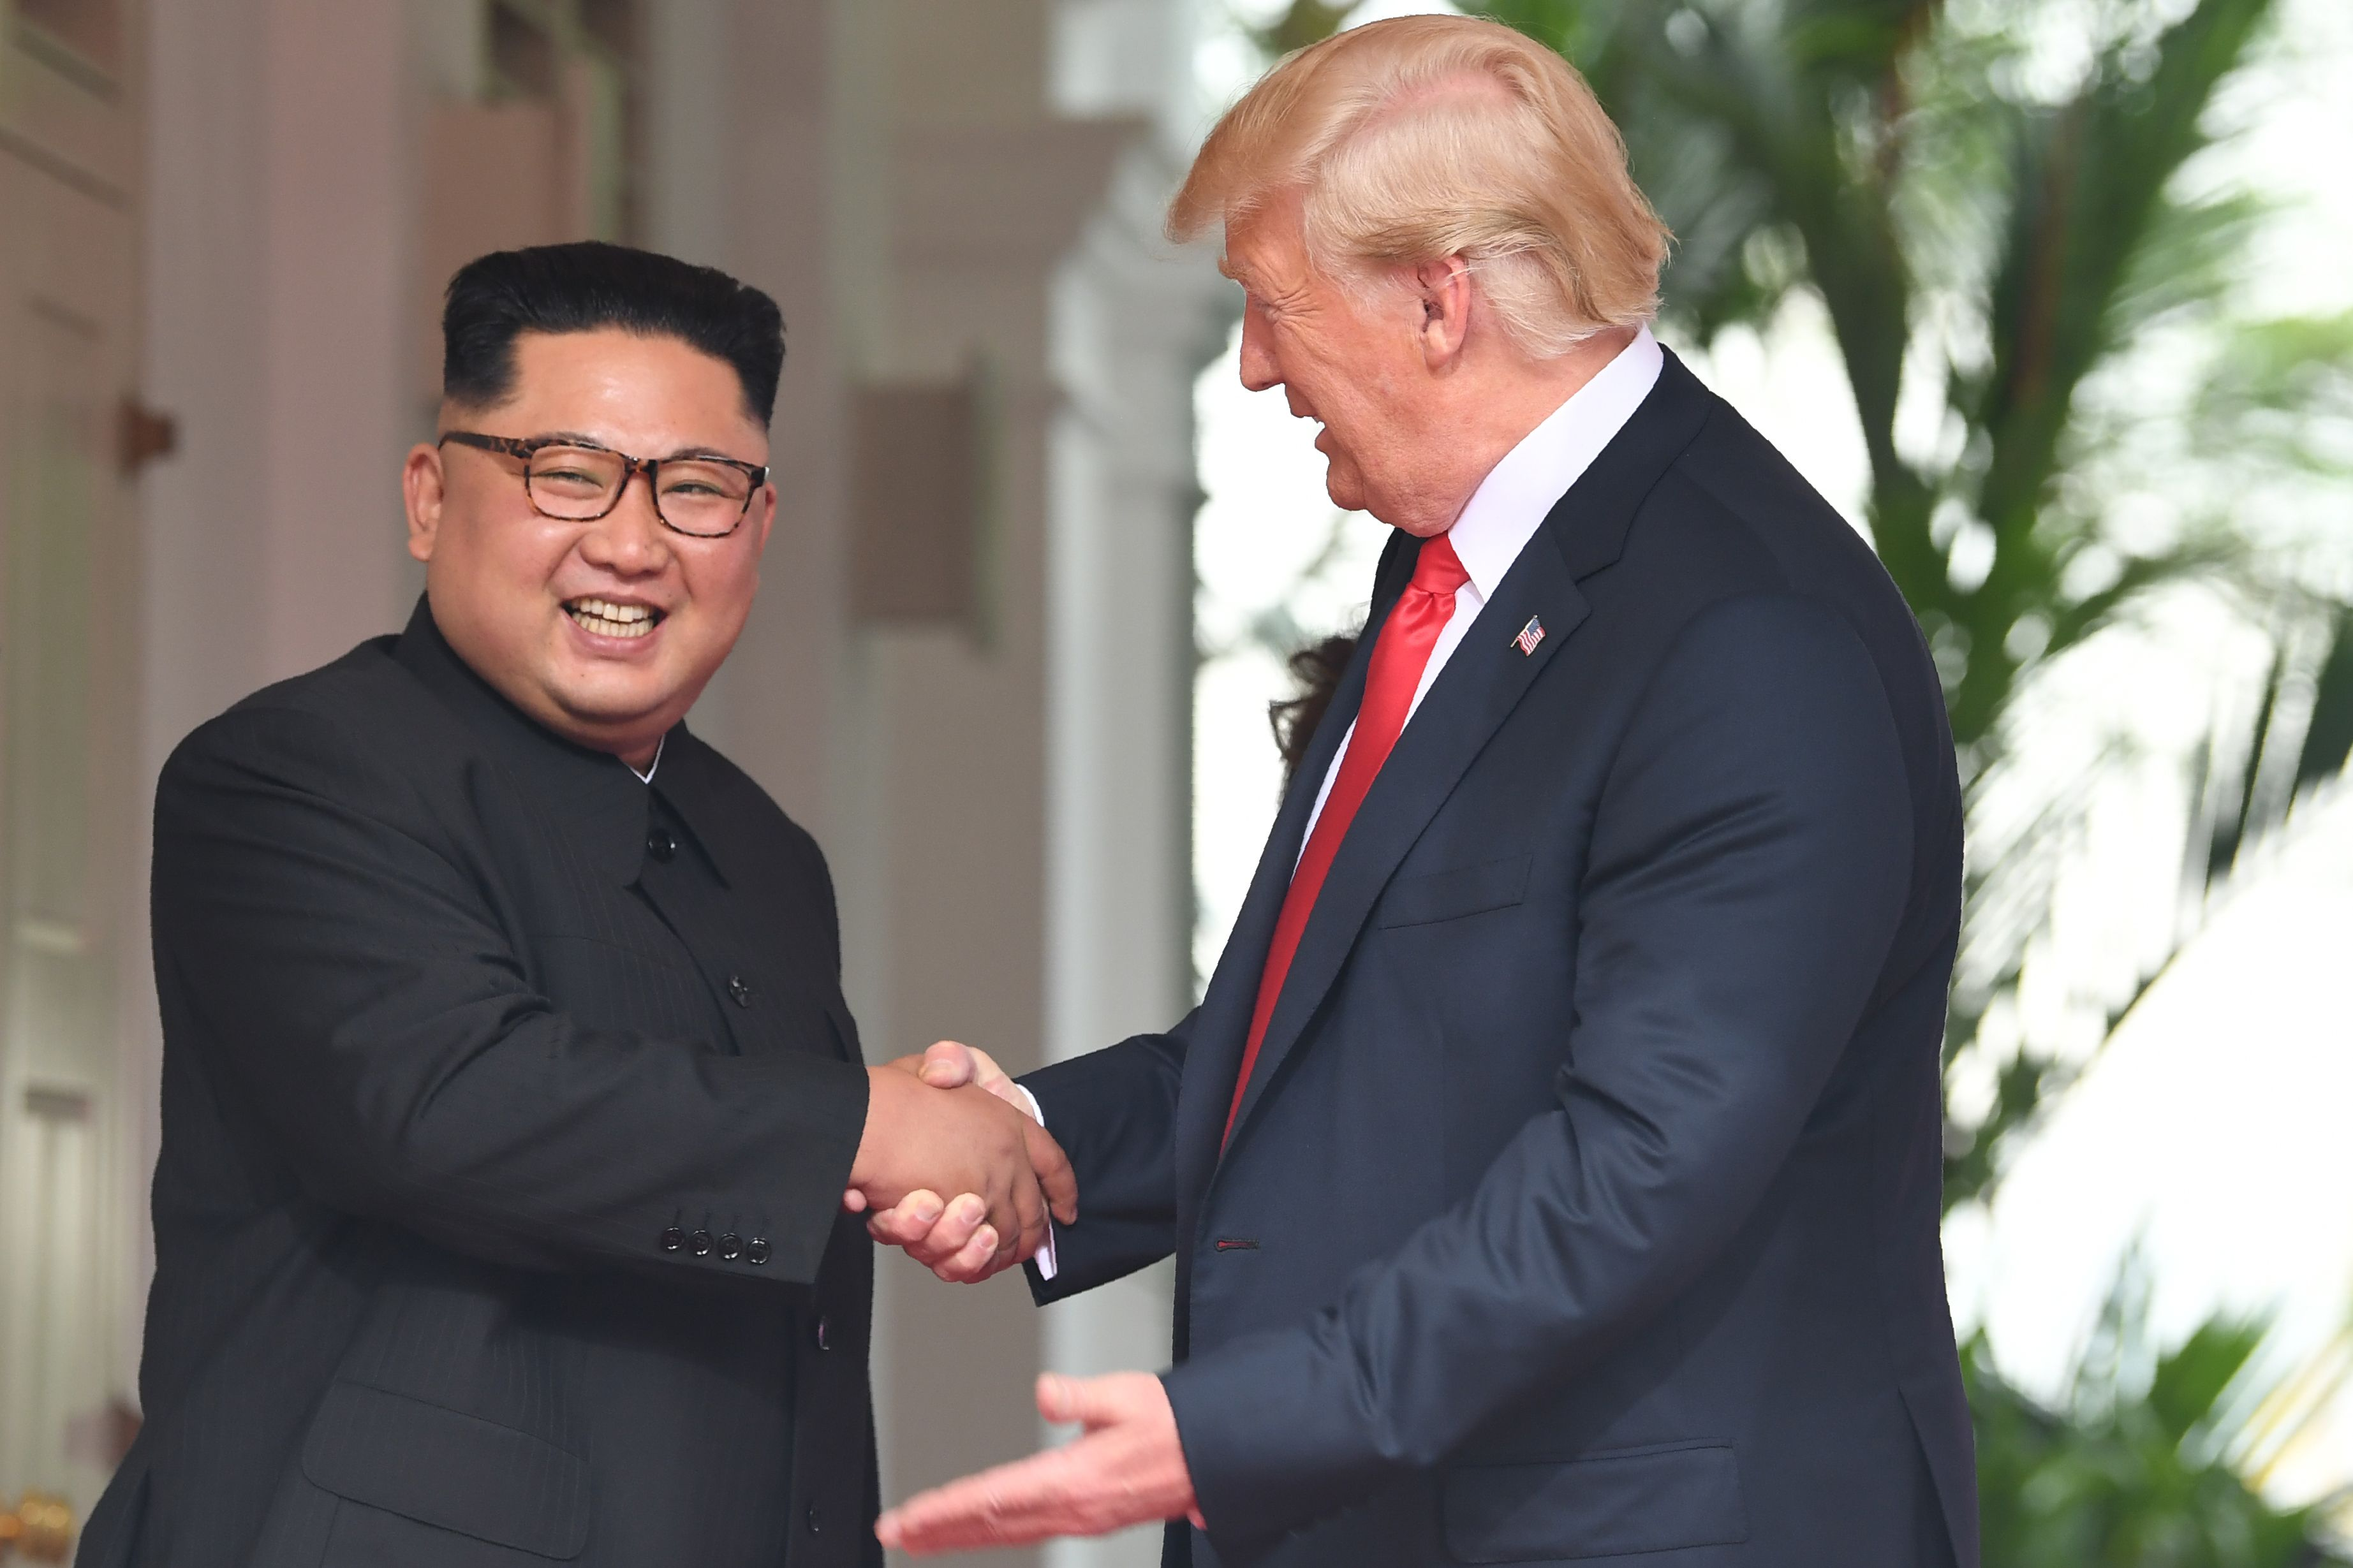 US President Donald Trump and North Korean leader Kim Jong Un in Singapore on June 12, 2018.